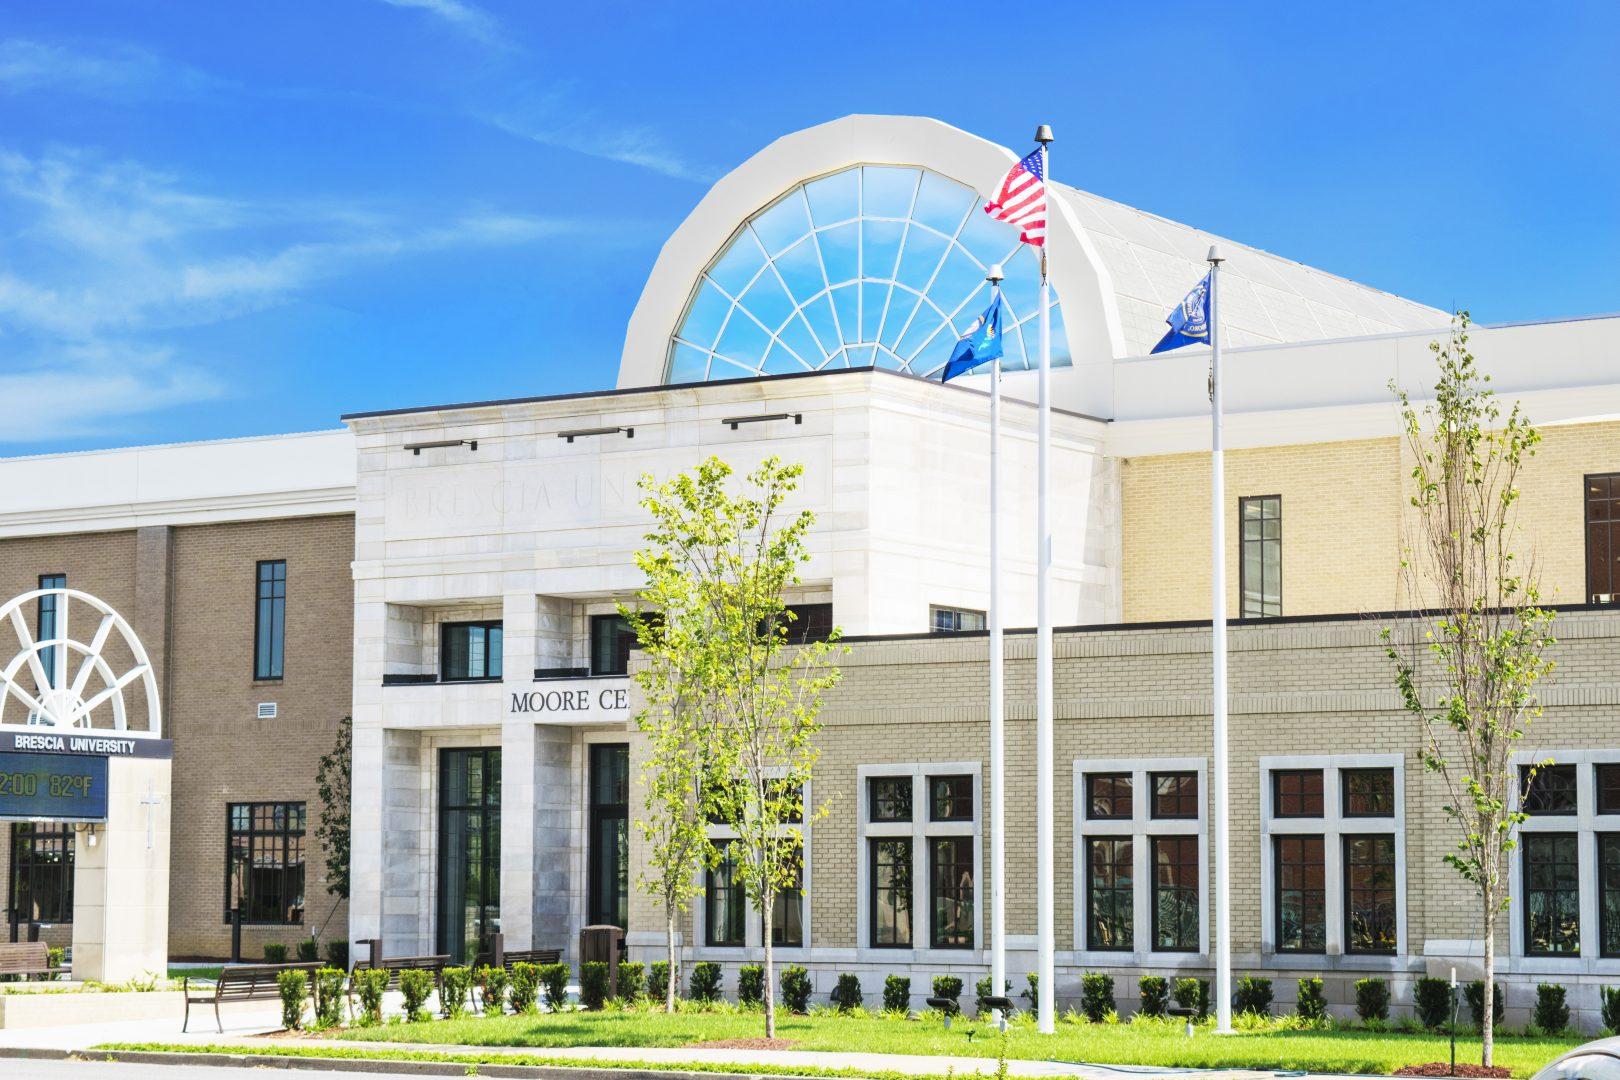 Brescia University – The Moore Center   Scott, Murphy & Daniel